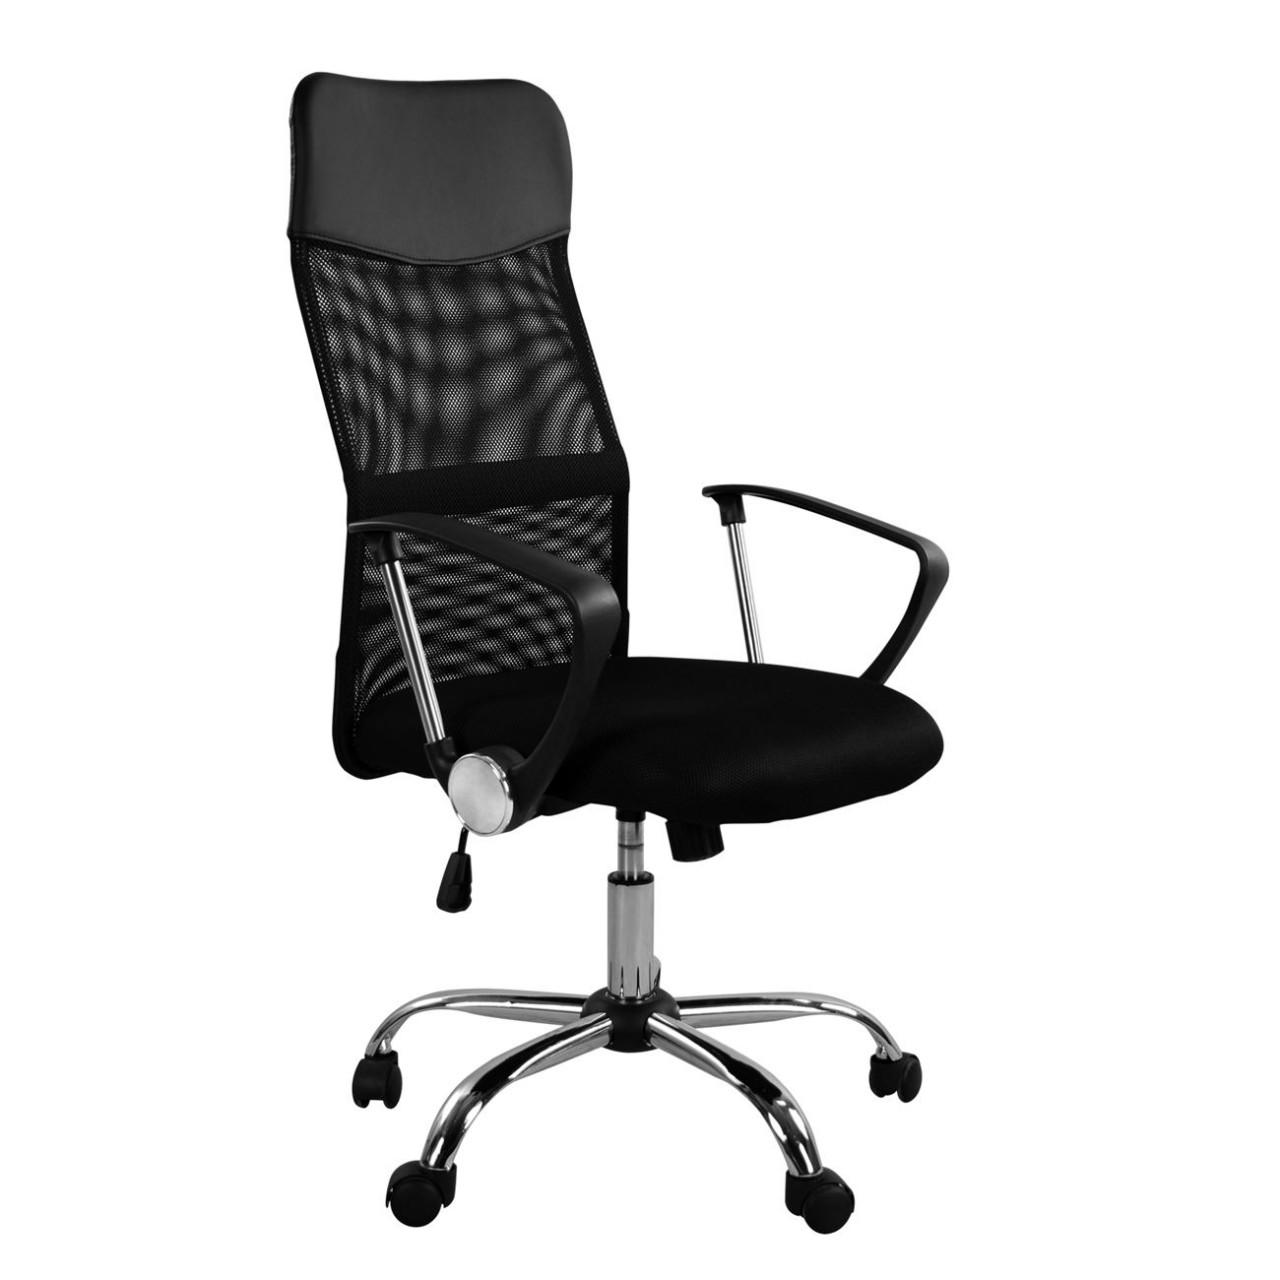 Desk Chair Adorno Black Hotel Business Furniture